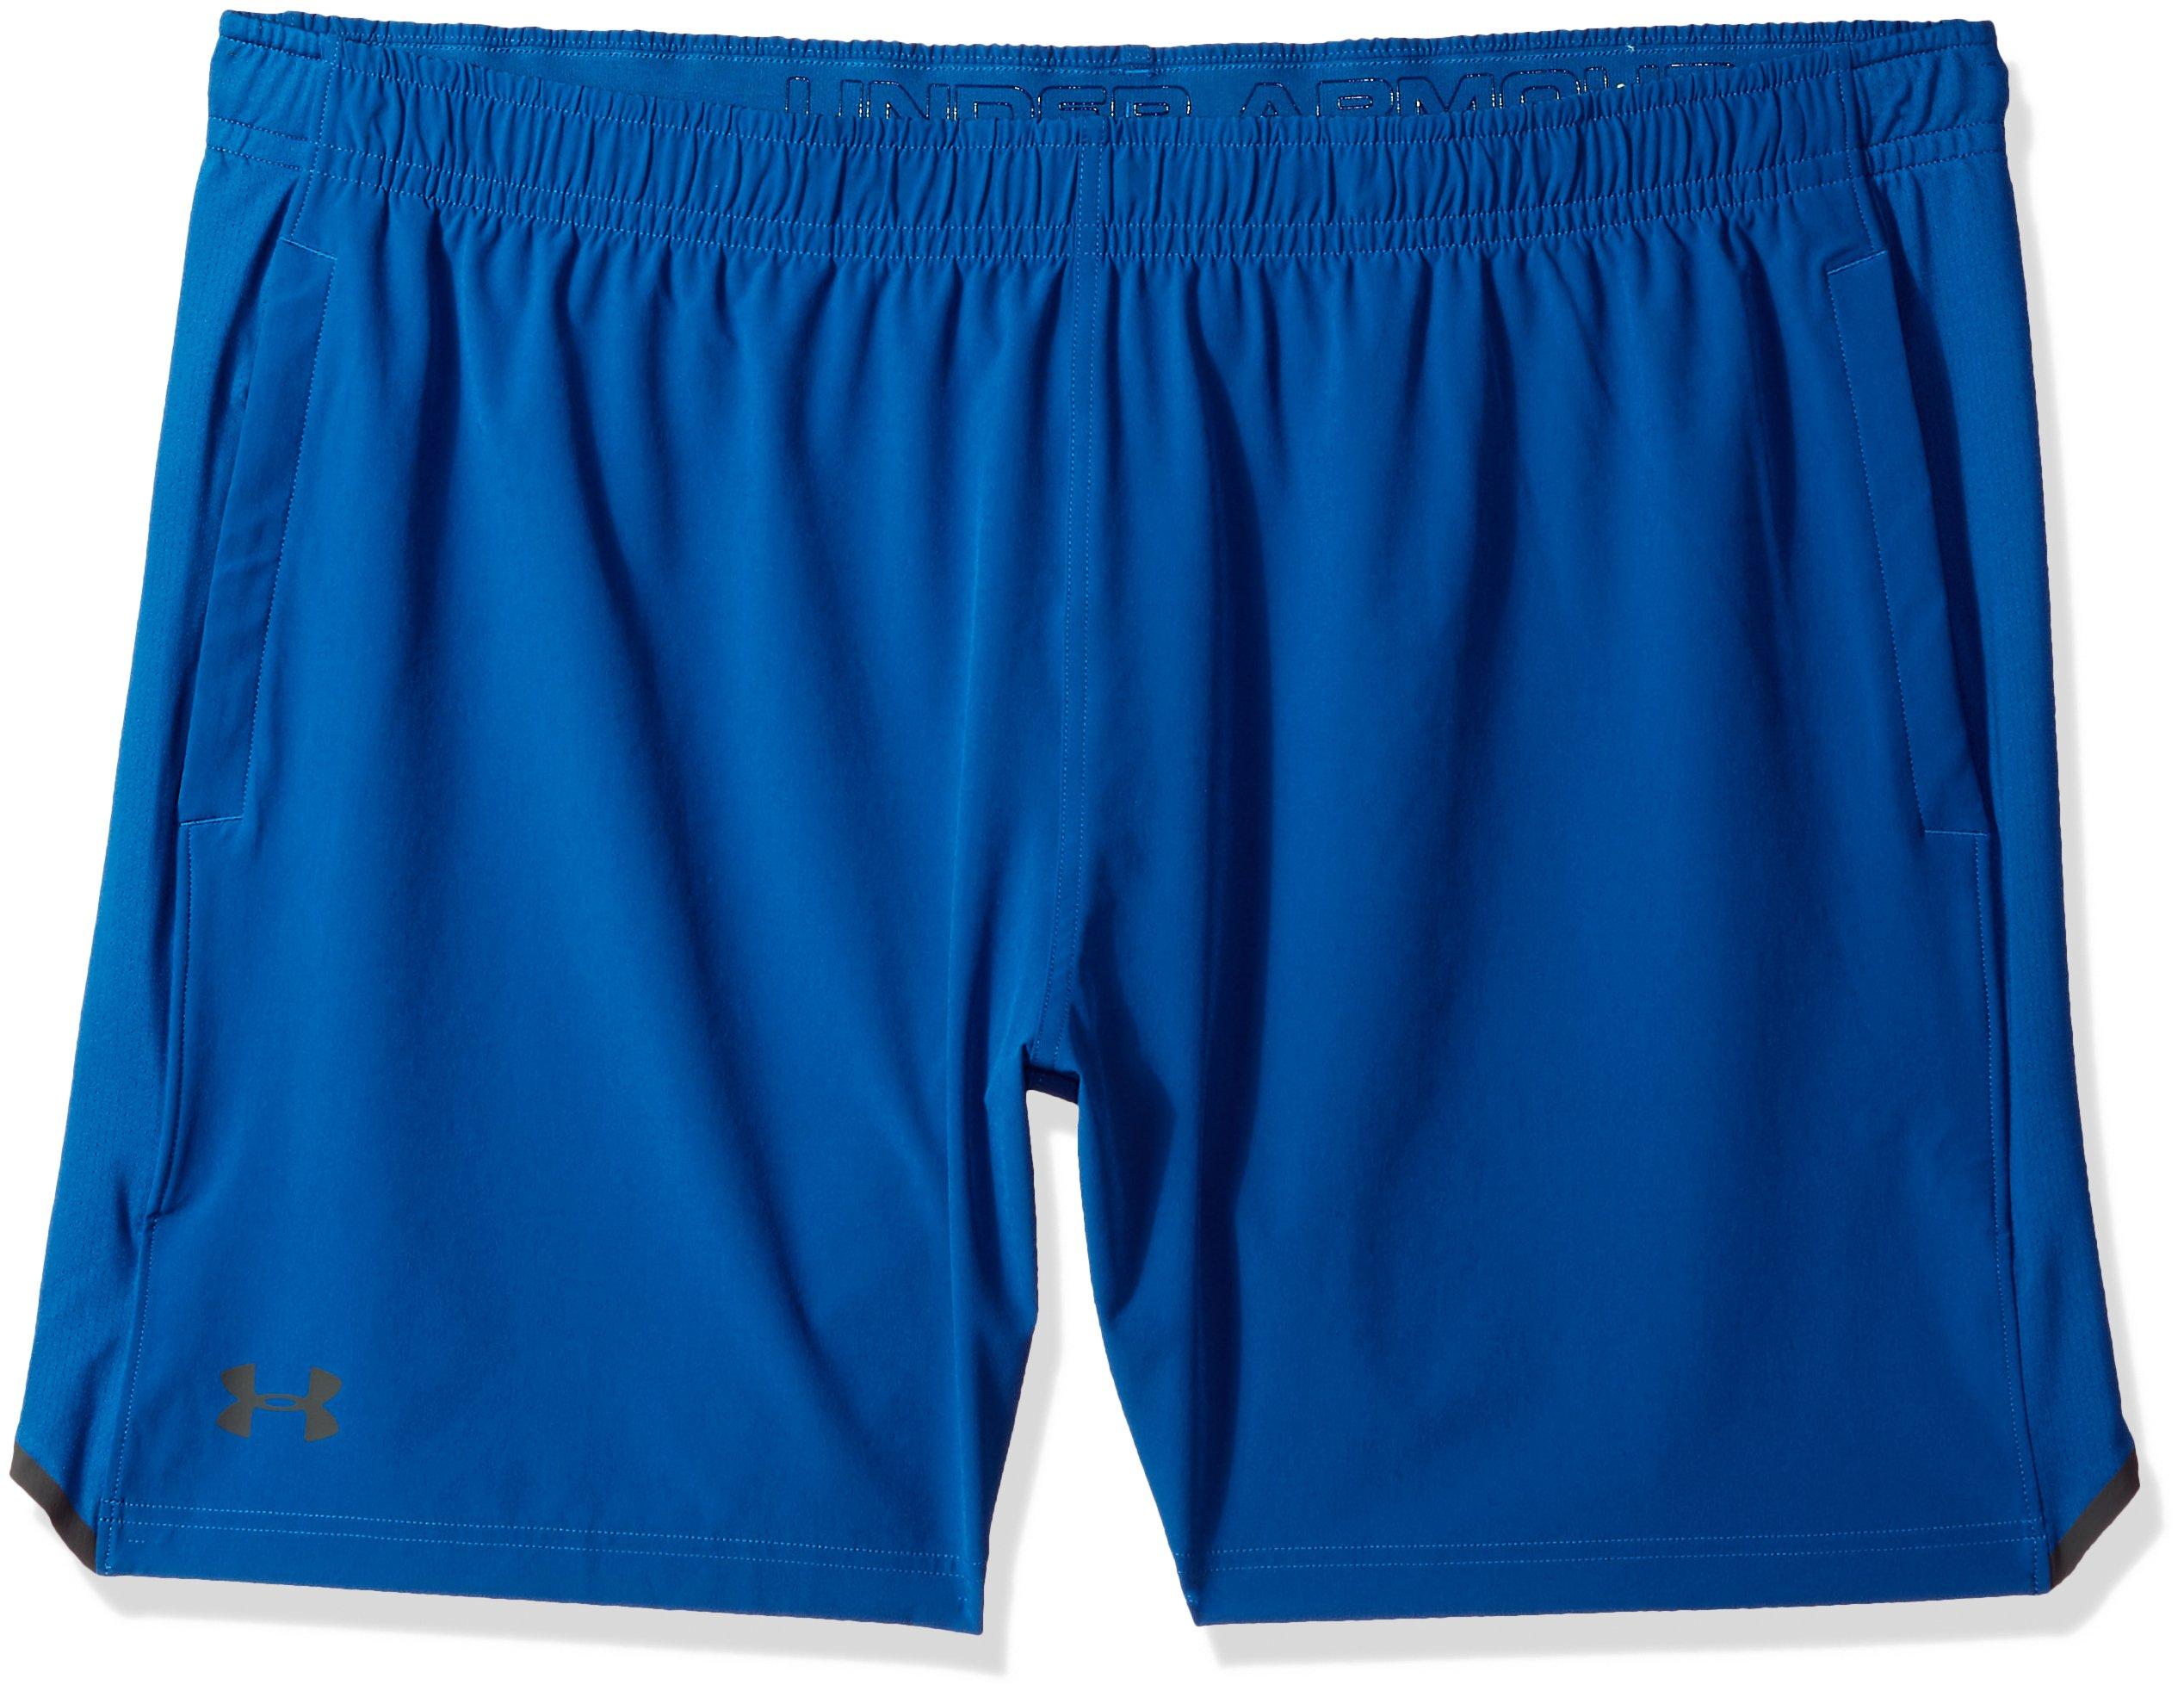 Under Armour Men's Forge 7'' Tennis Shorts, Moroccan Blue (487)/Black, XXX-Large